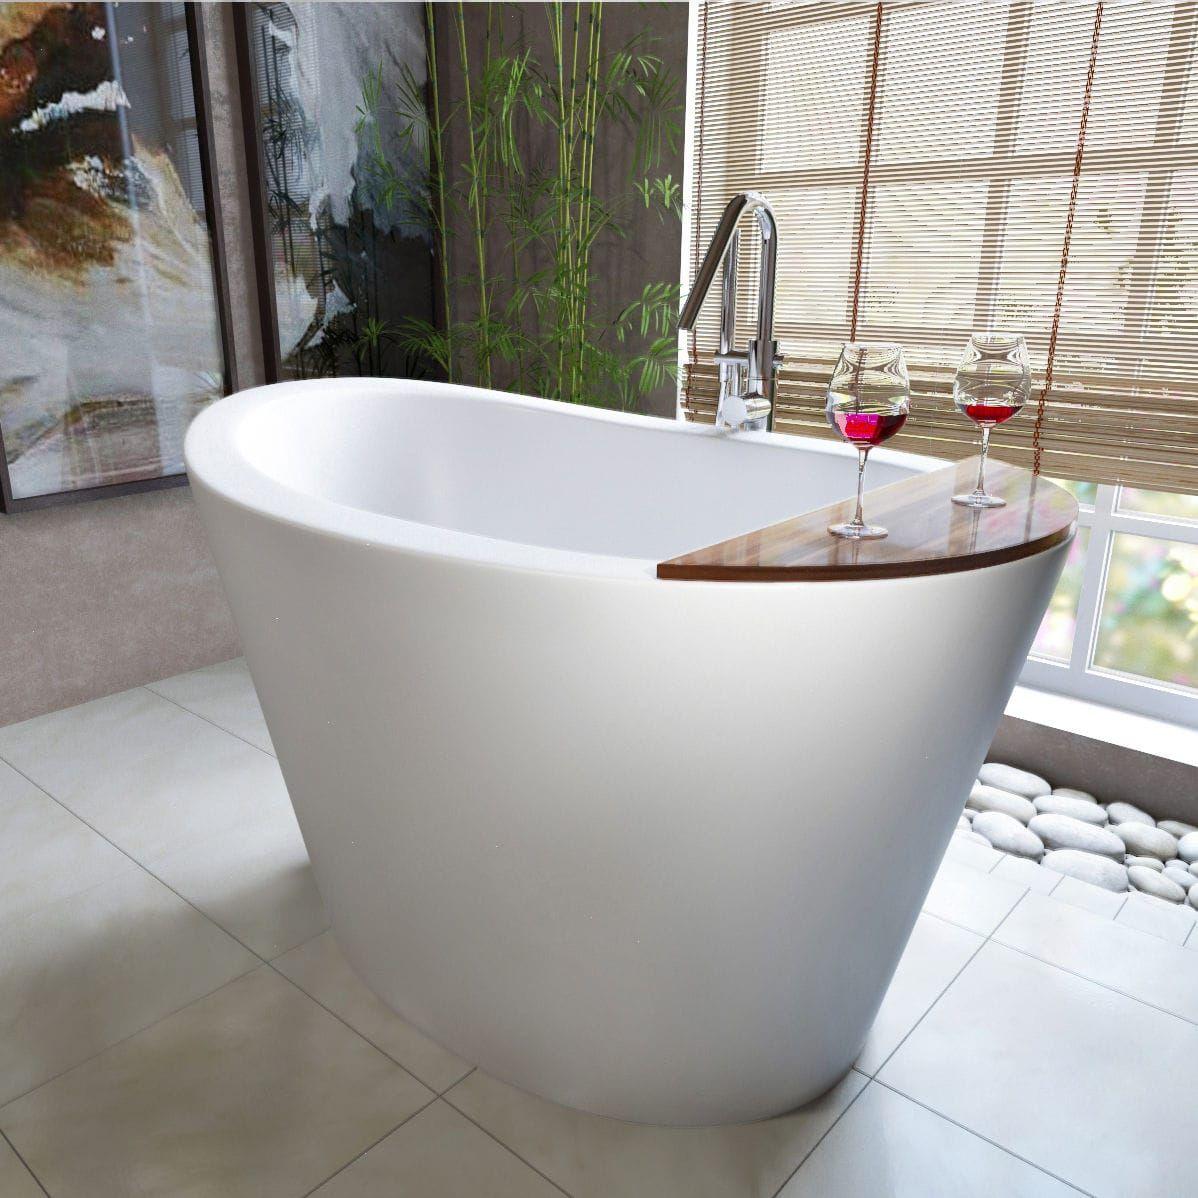 Freestanding Bathtub Oval Stone Deep True Ofuro Aquatica Plumbing Group Japanese Bathtub Japanese Soaking Tubs Soaking Bathtubs